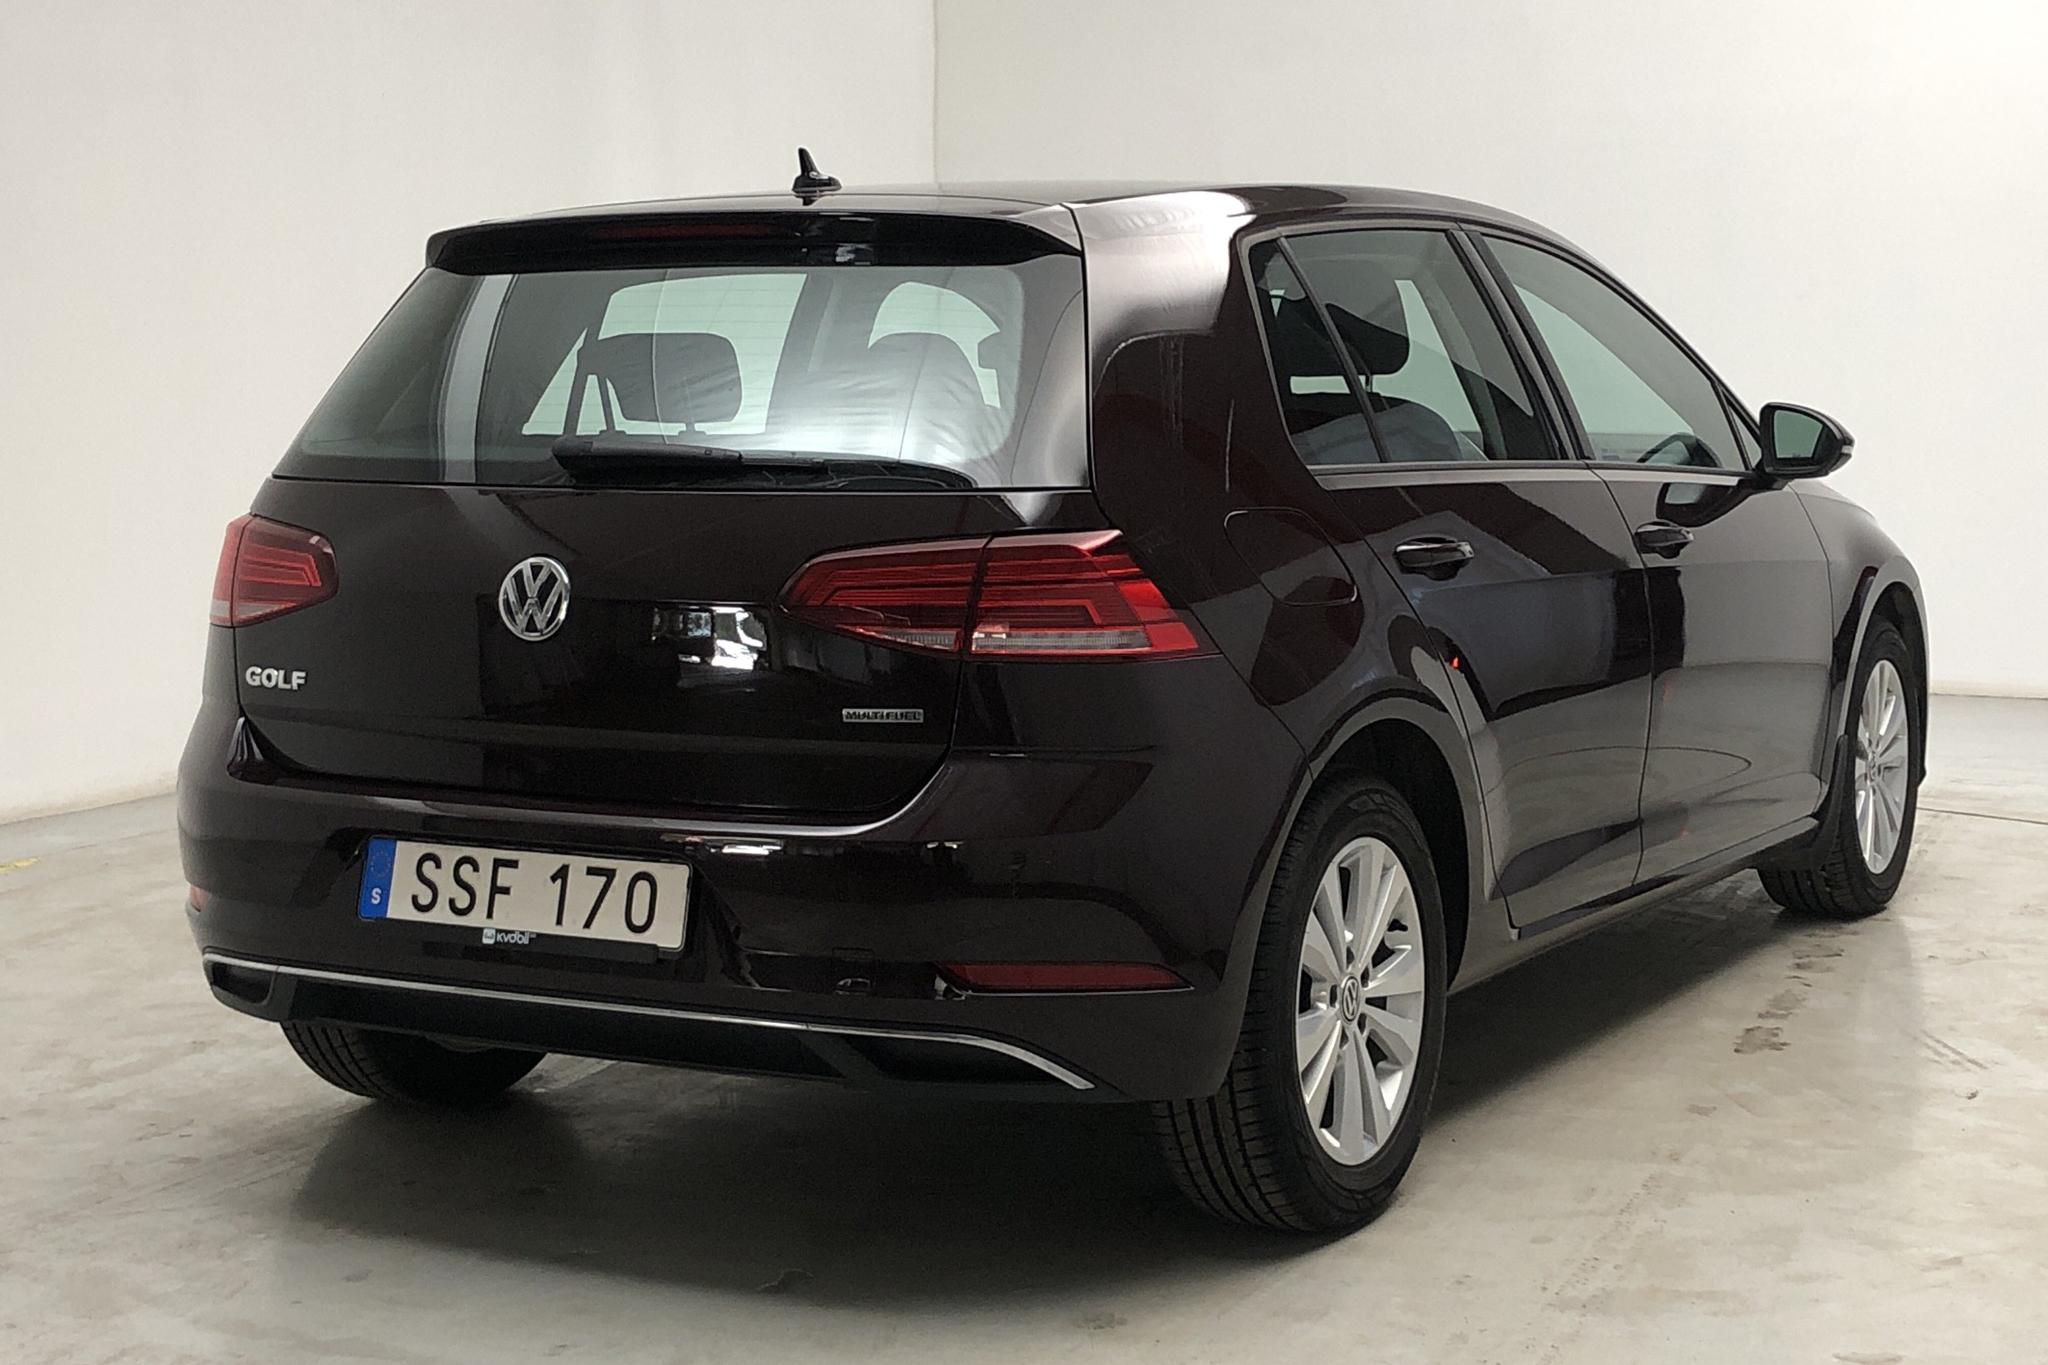 VW Golf VII 1.4 TSI Multifuel 5dr (125hk) - 26 300 km - Manual - black - 2018